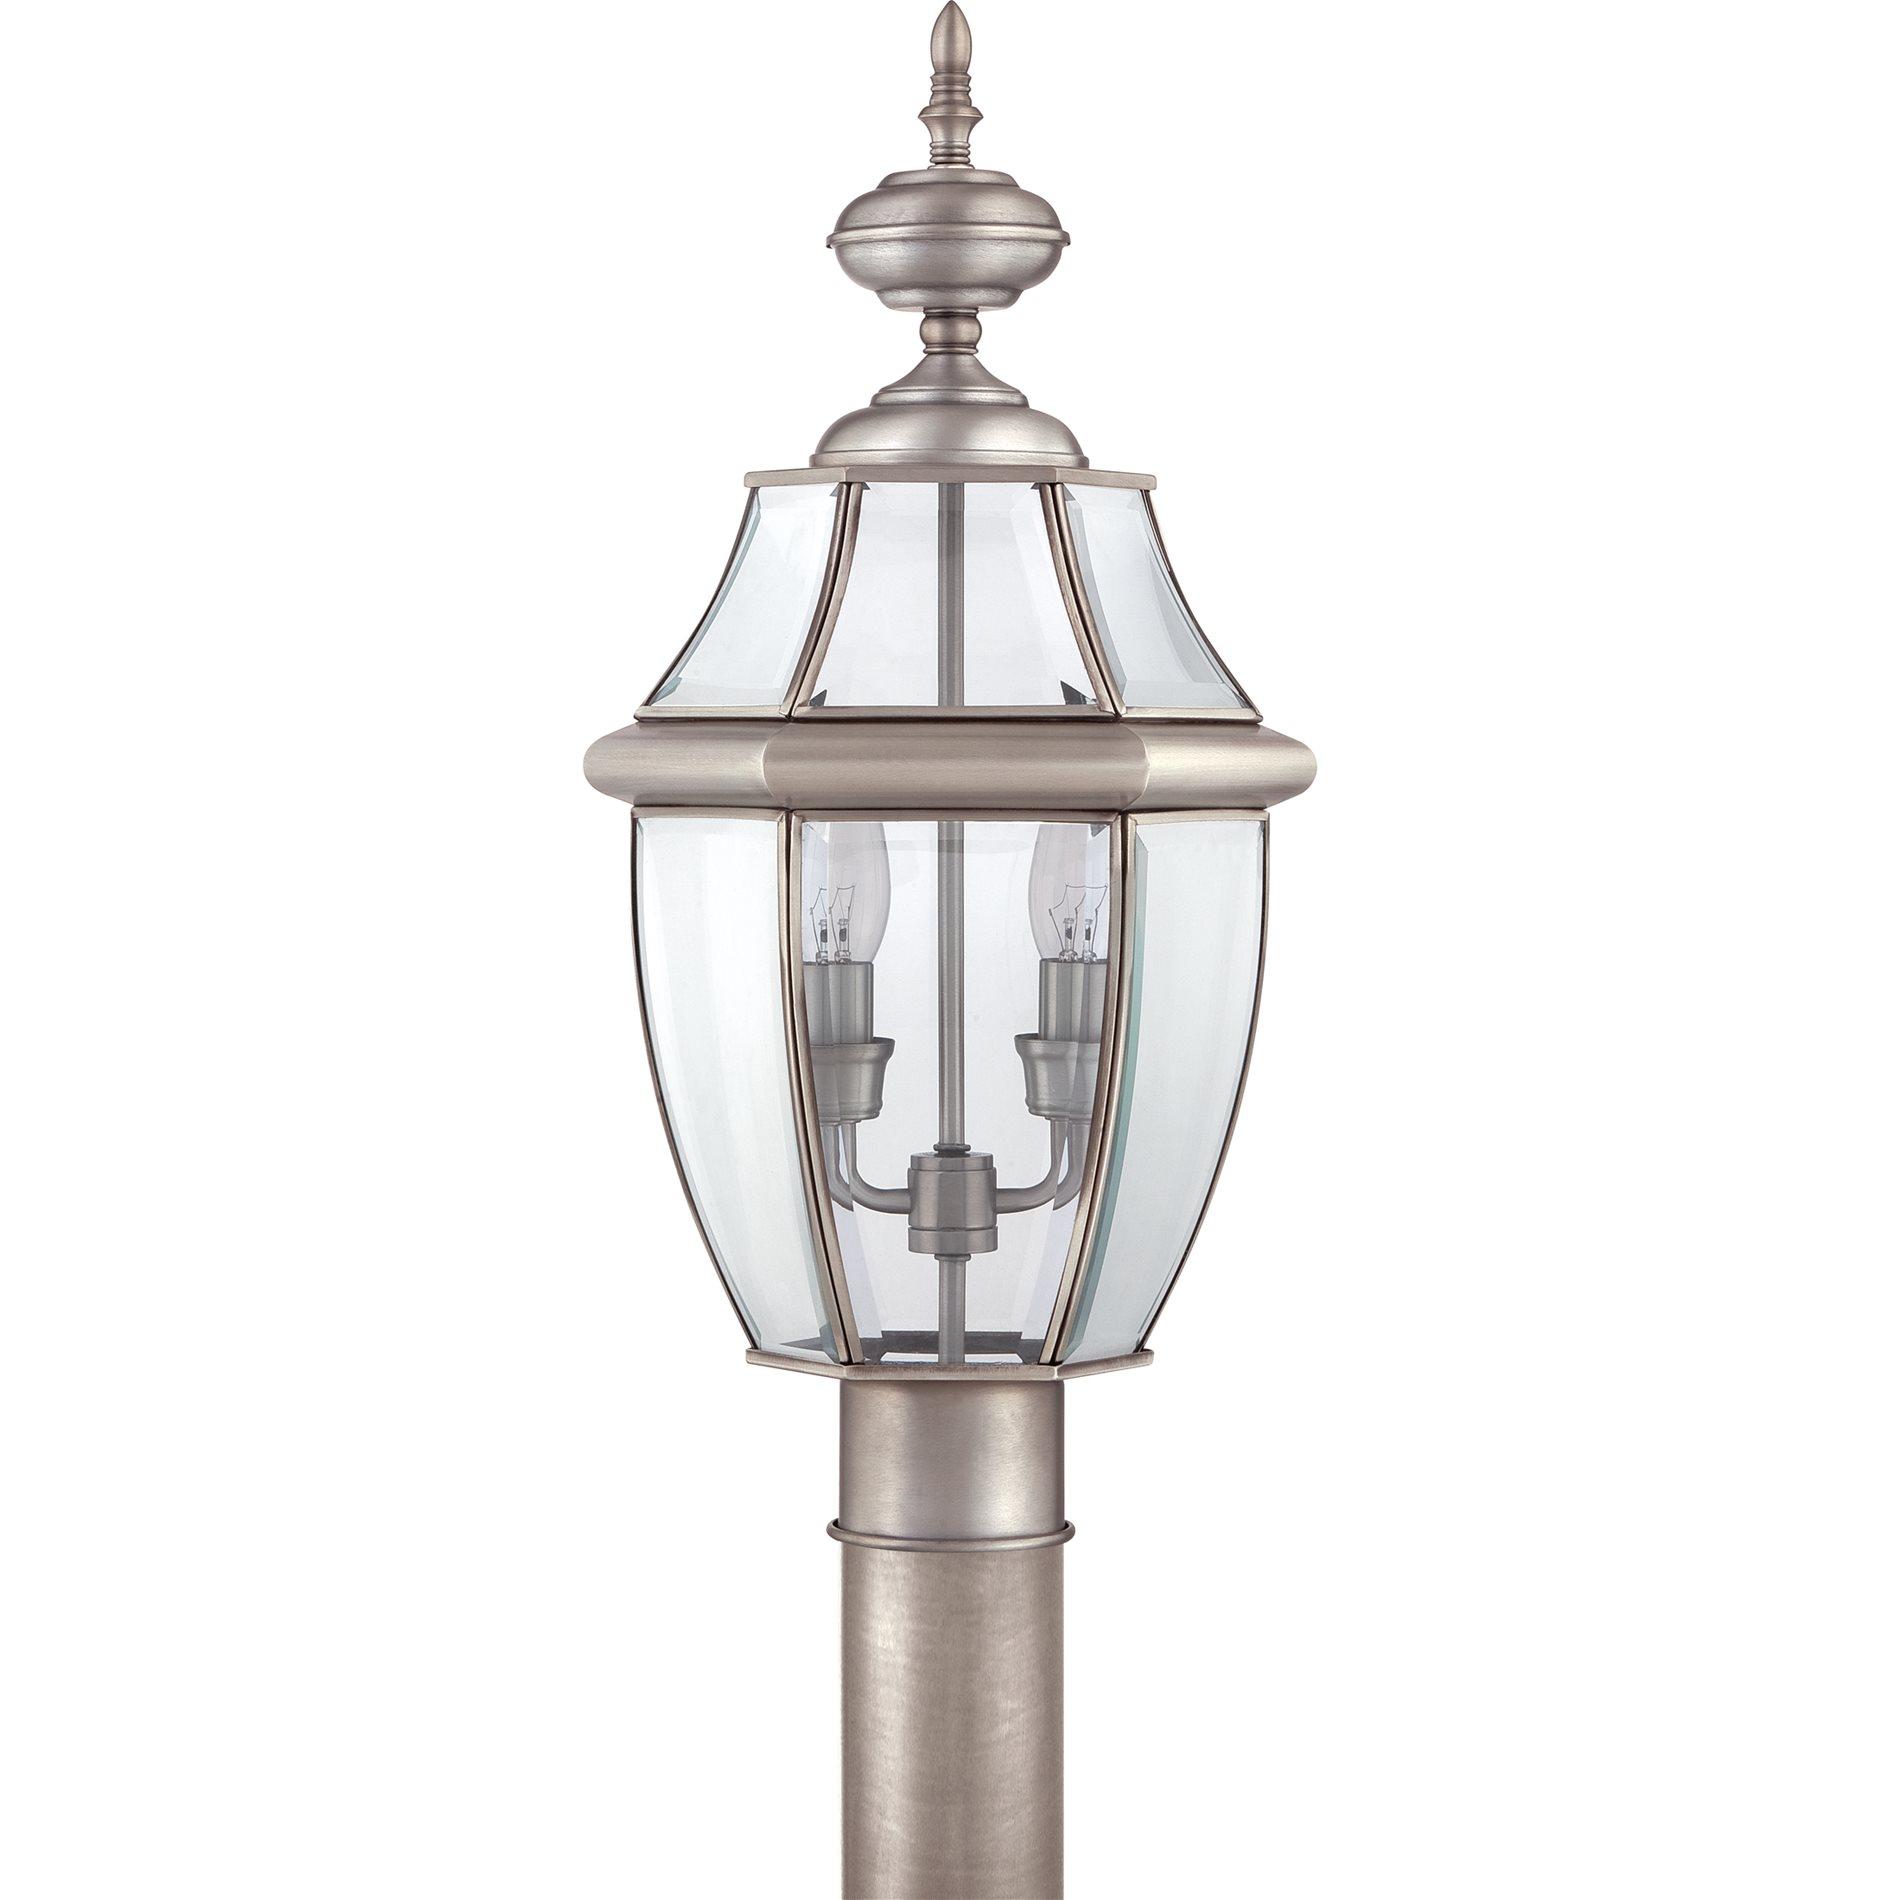 Quoizel Outdoor Lighting Newbury: Quoizel NY9042P Newbury Traditional Outdoor Post Lantern